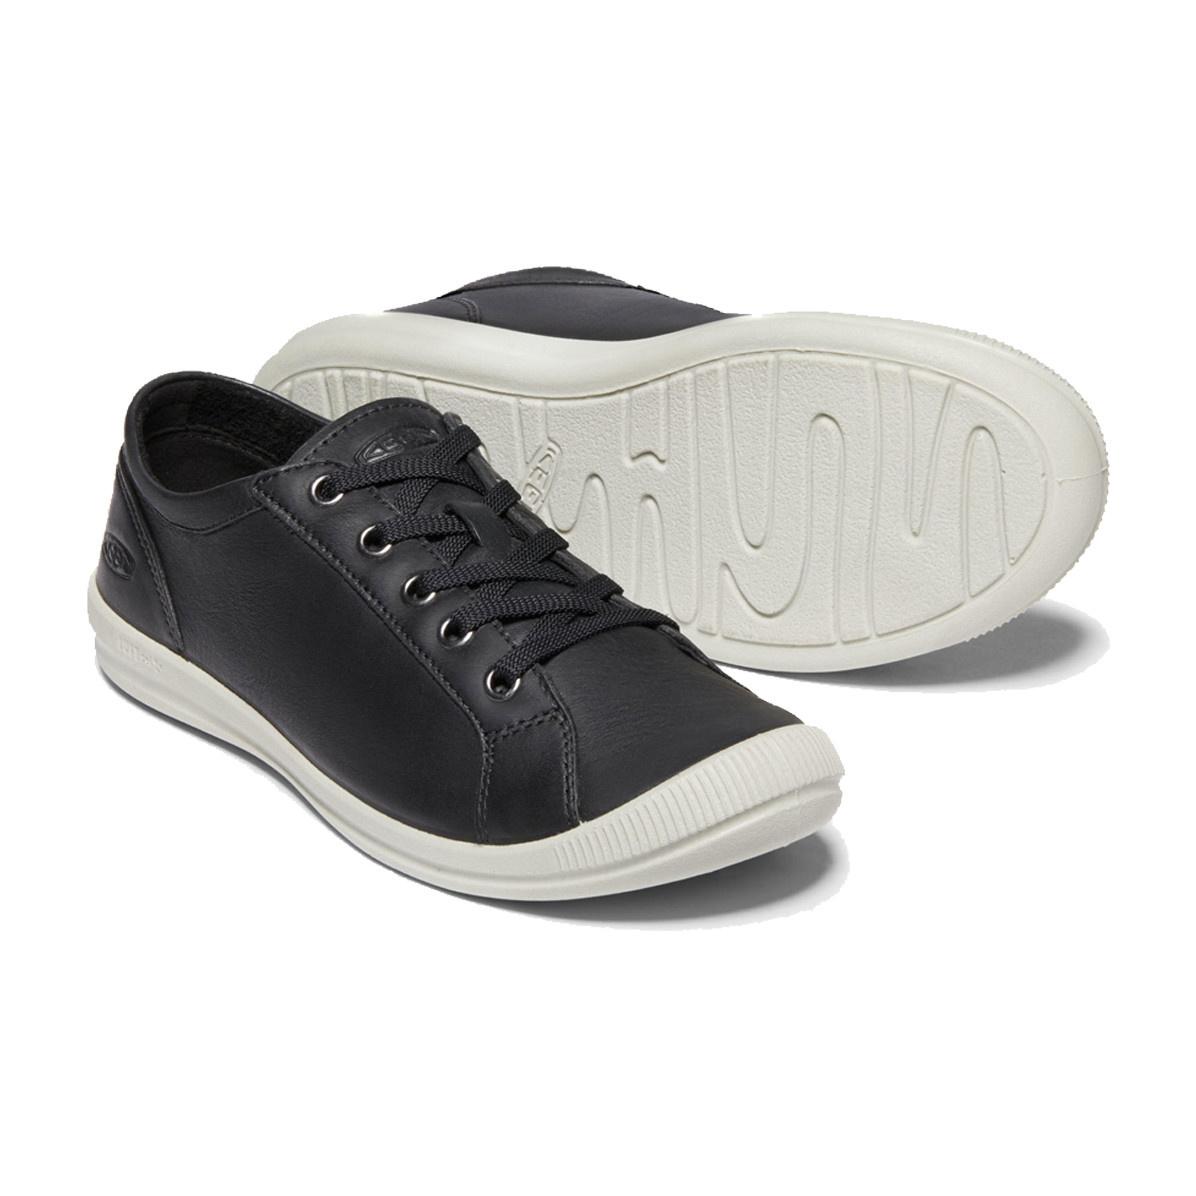 Keen Keen Women's Lorelai Sneaker